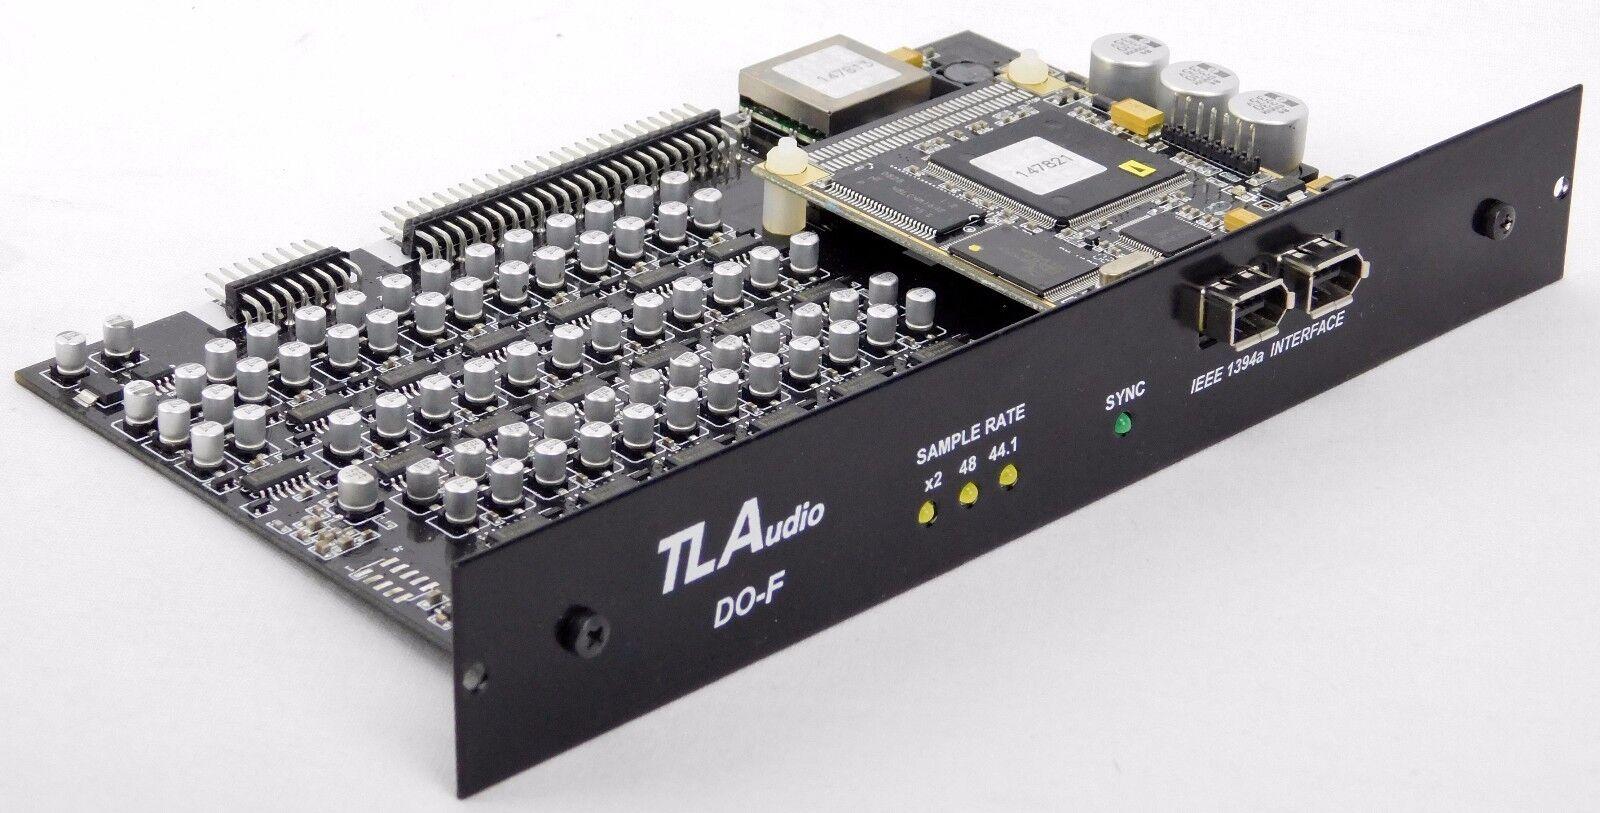 TL Audio DO-F FireWire Expansion Interface für FAT Track M1-F8 F12 + Garantie